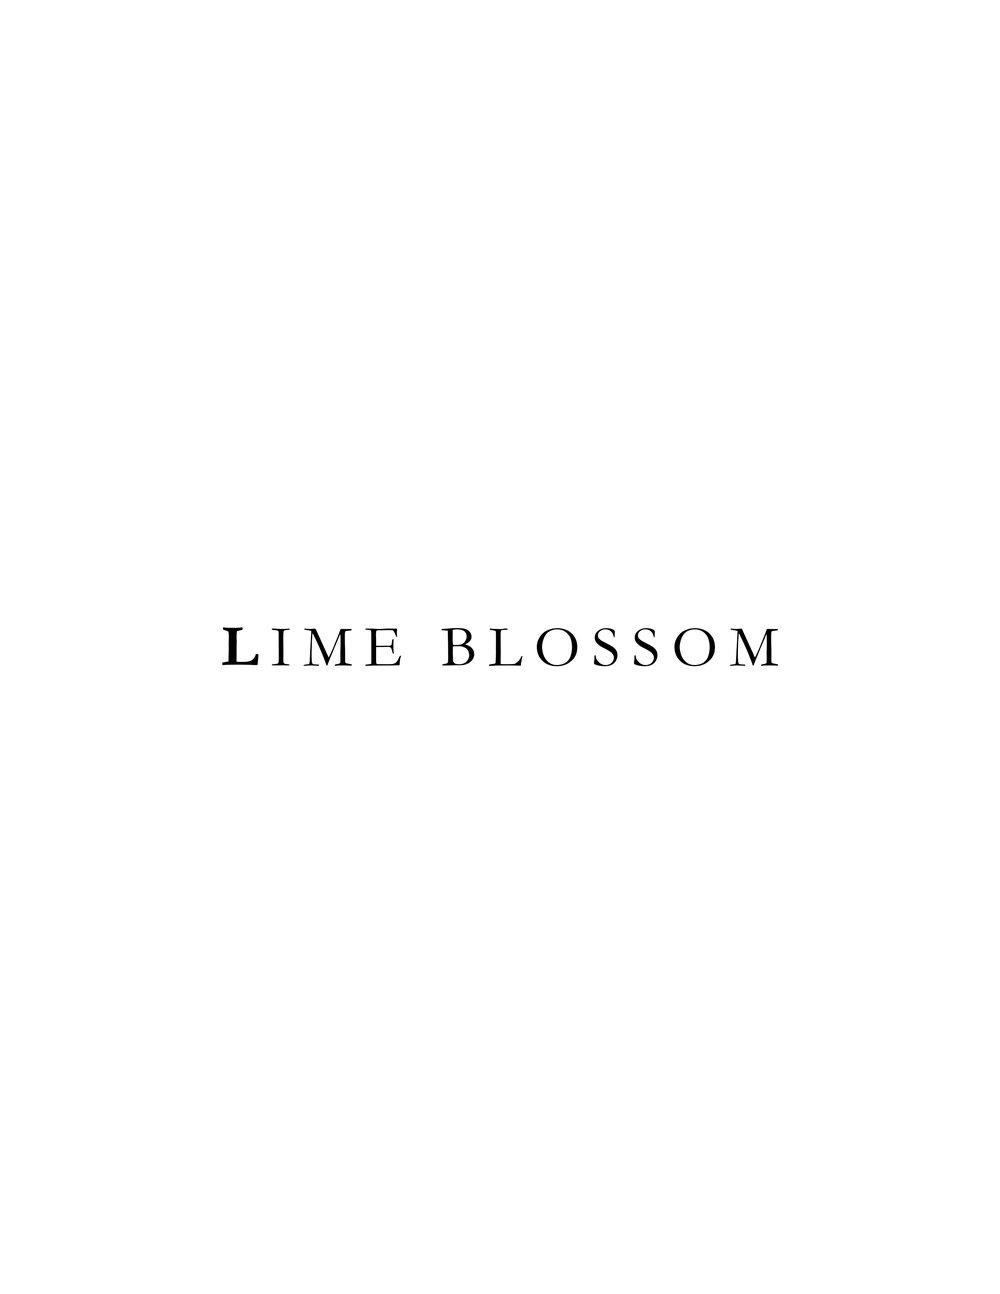 Lime Blossom Text.jpg